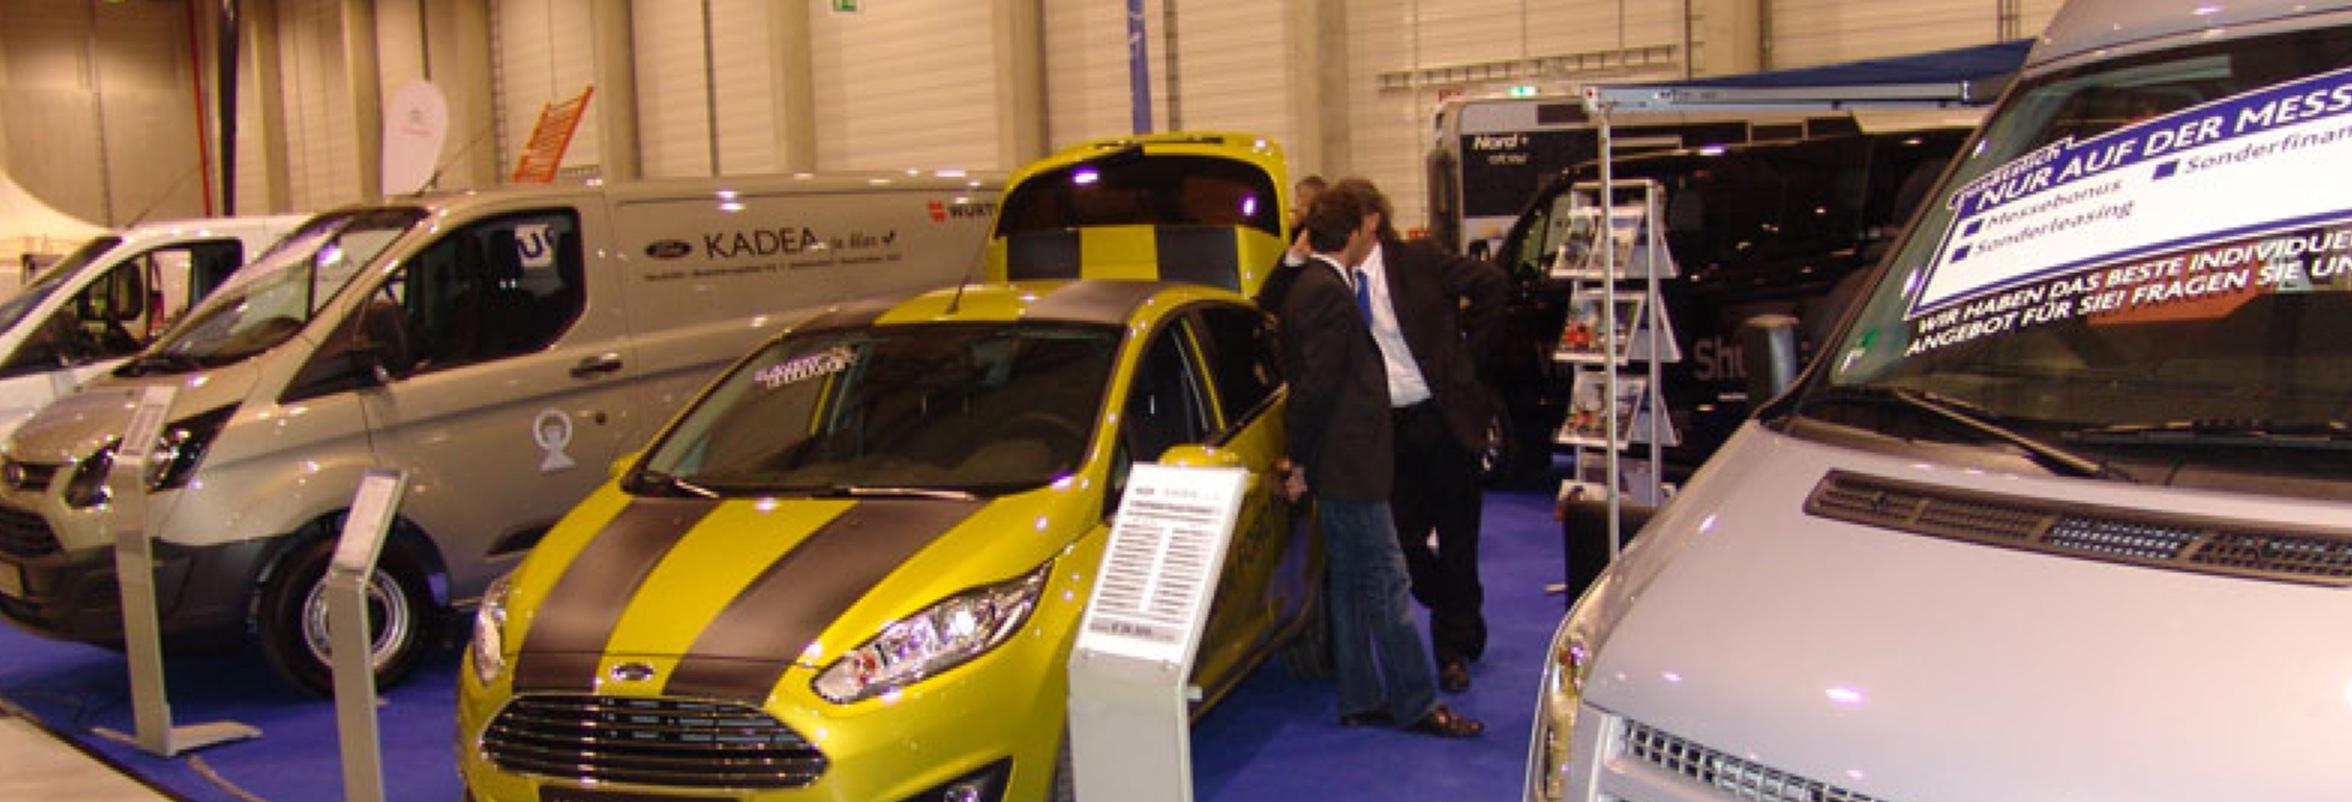 Nutzfahrzeugmesse, Messe für Nutzfahrzeuge, Automobilmesse Berlin, Logistikmesse